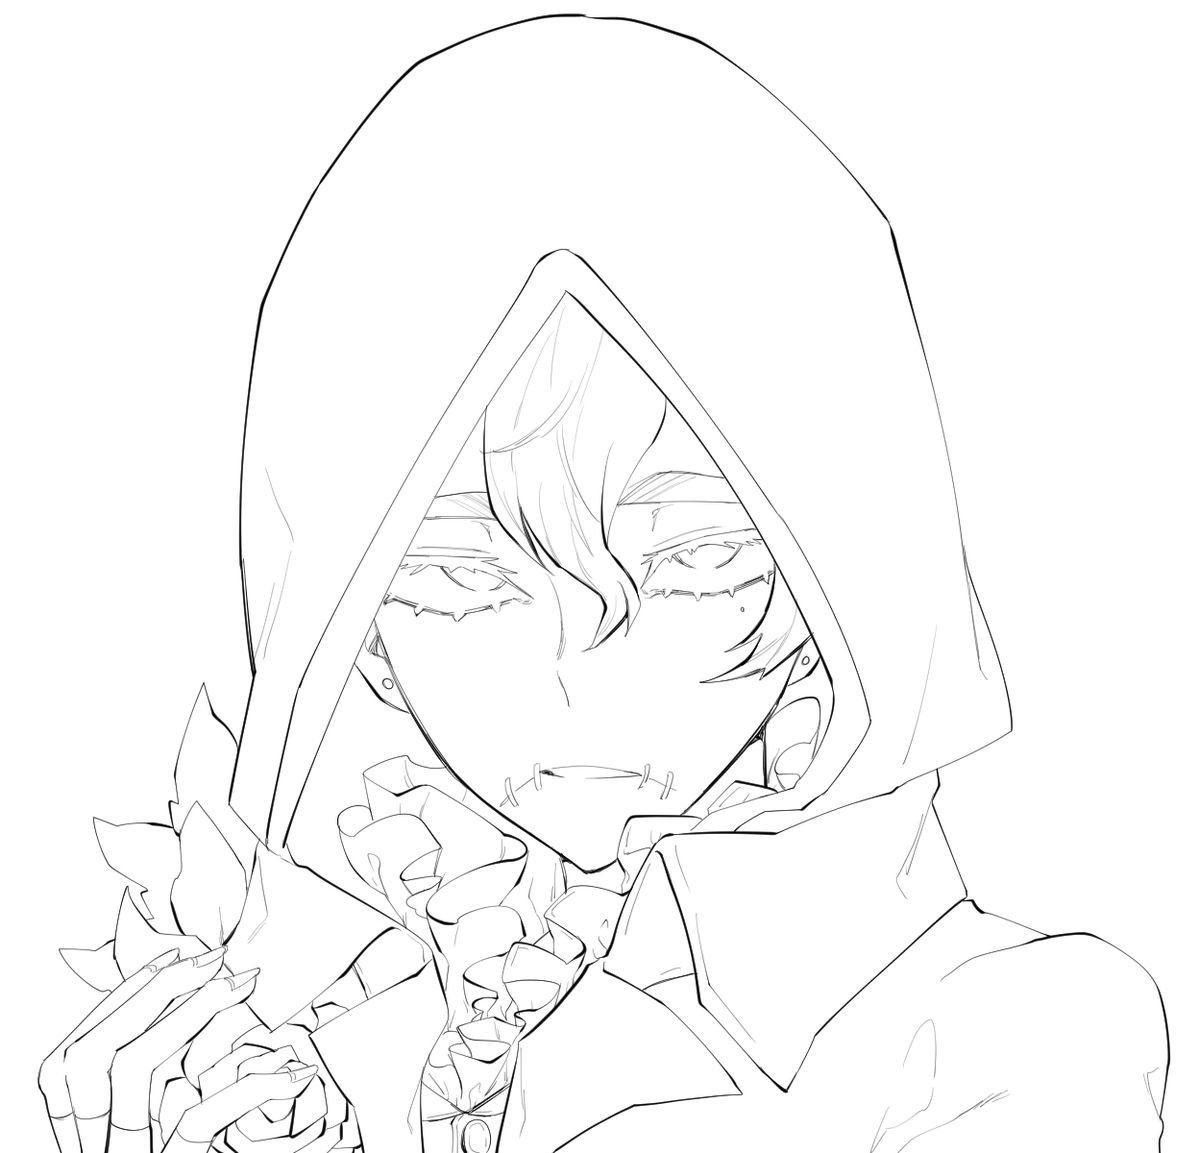 Truyện Ko Cần Mo Tả Truyệnngắn Truyện Ngắn Amreading Books Wattpad In 2020 Drawing Base Manga Drawing Tutorials Identity Art